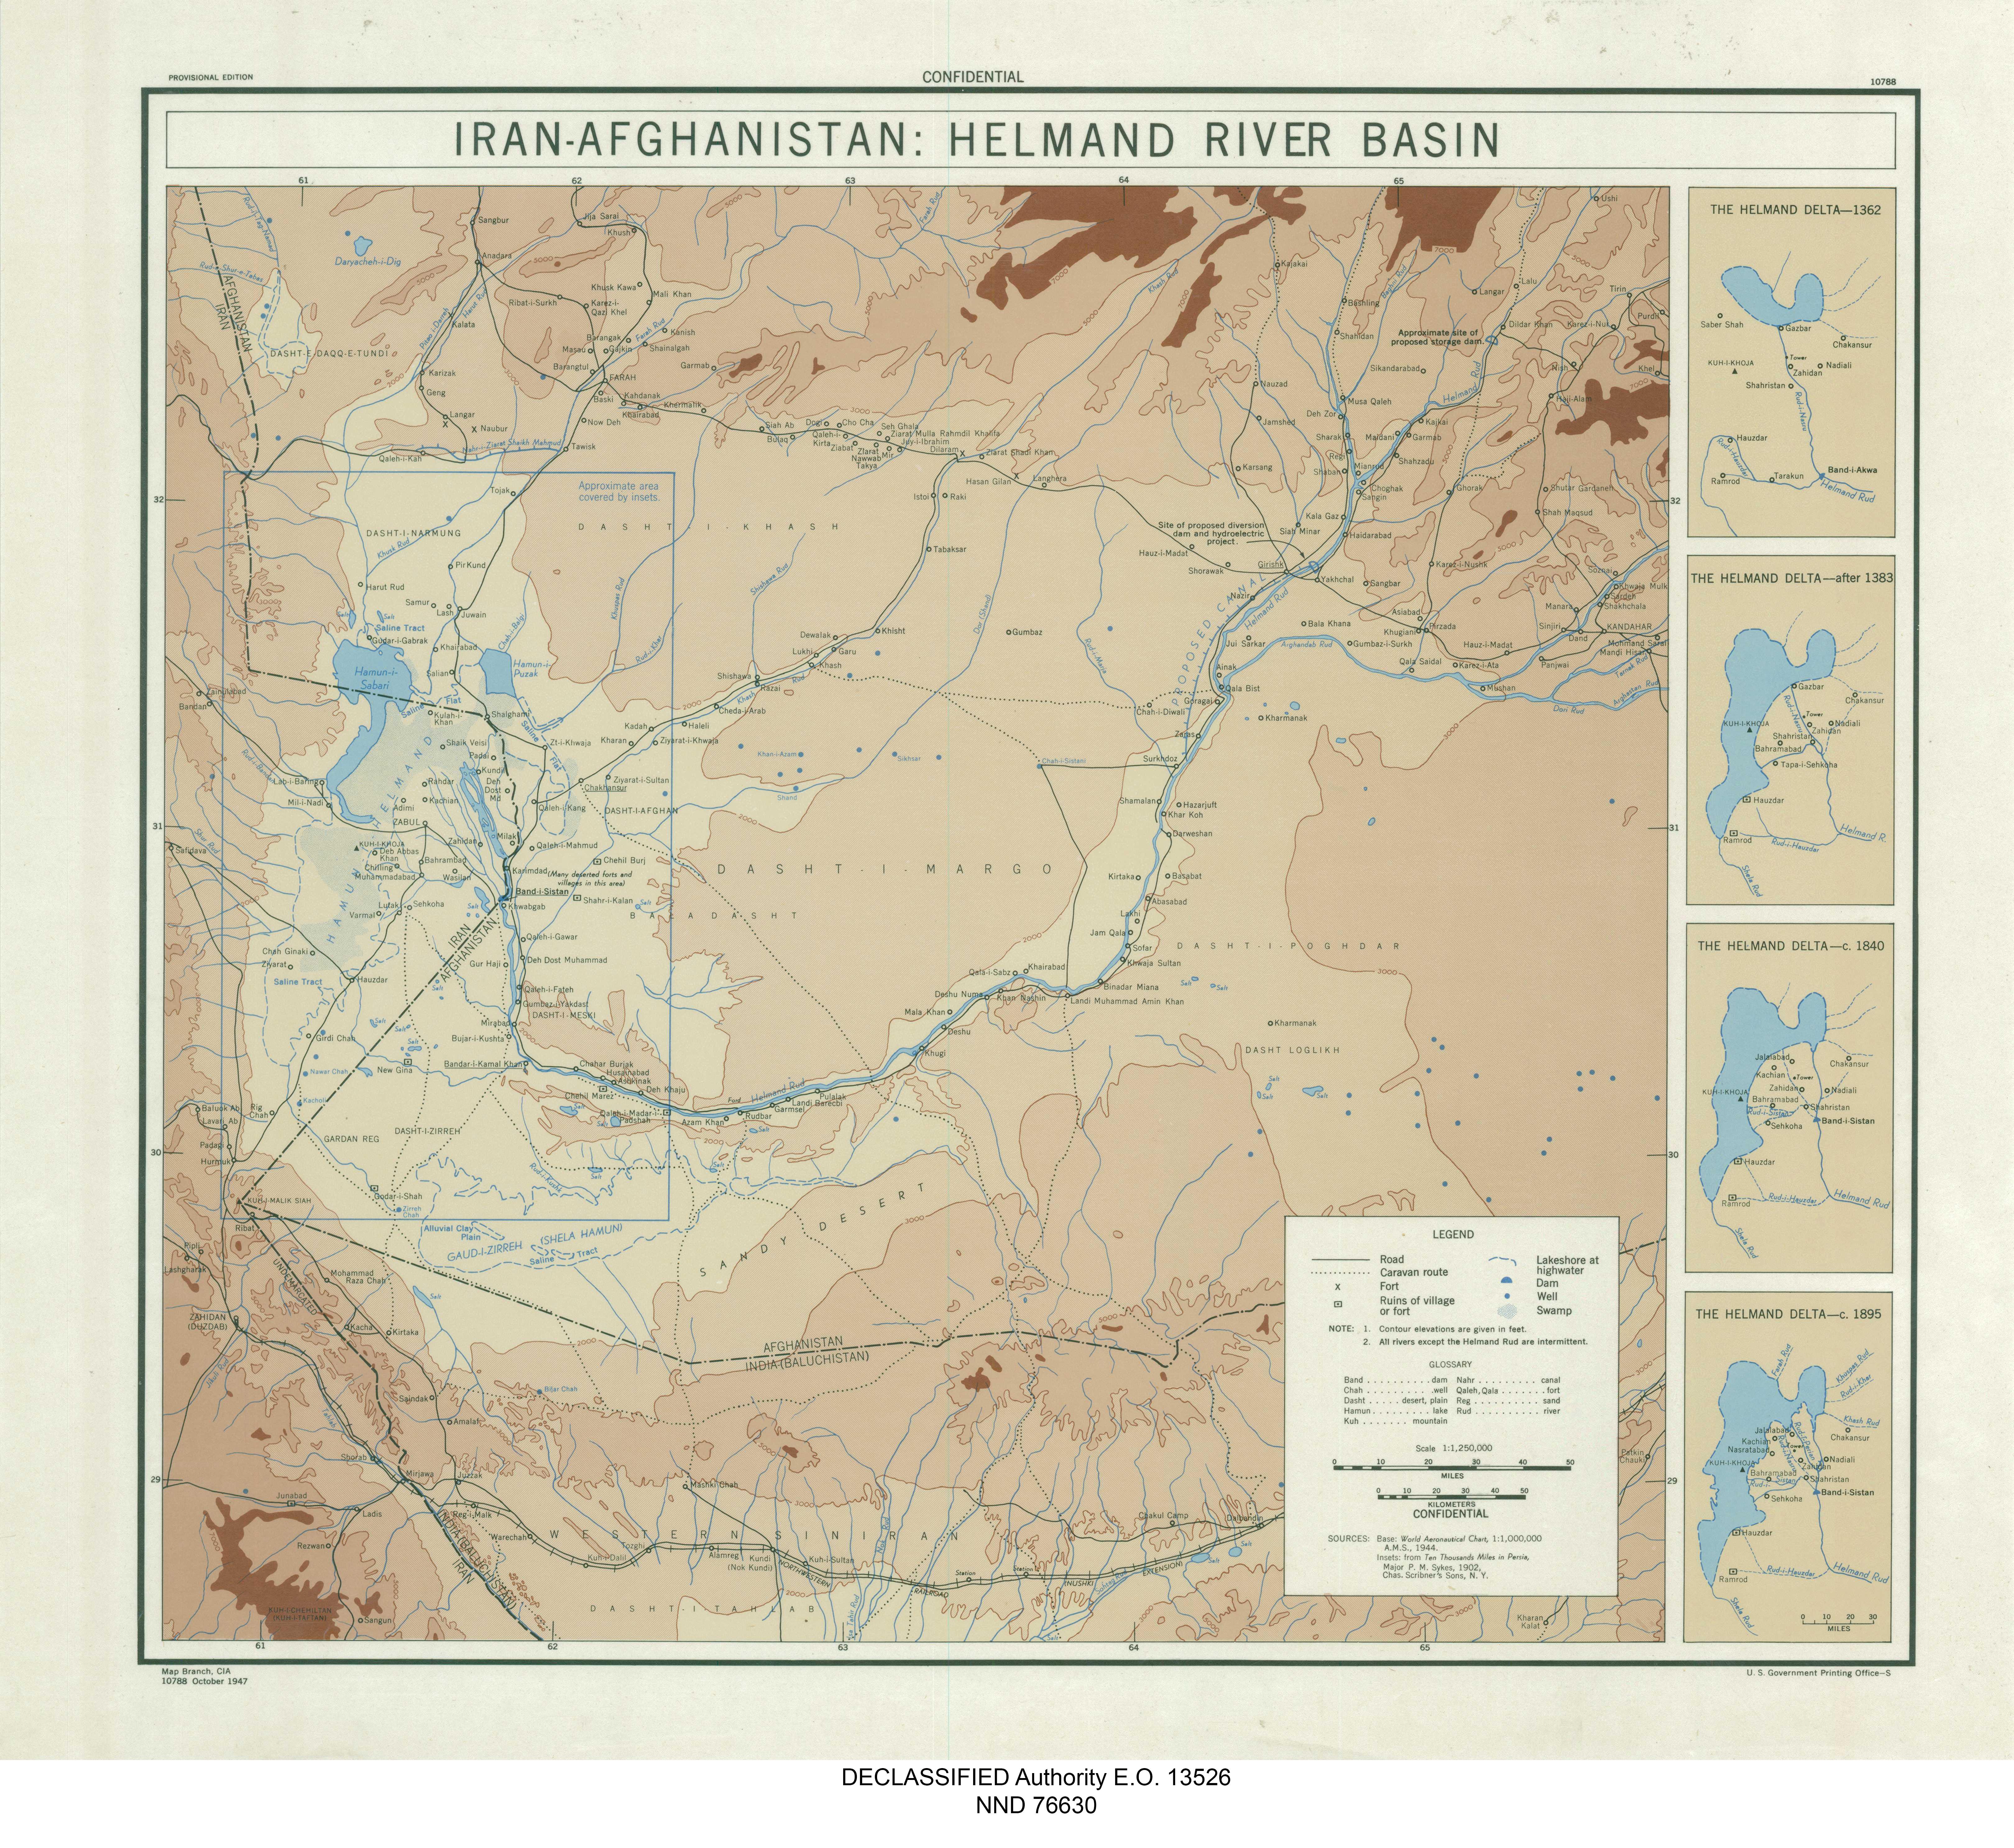 Iran-Afghanistan Helmand River Basin